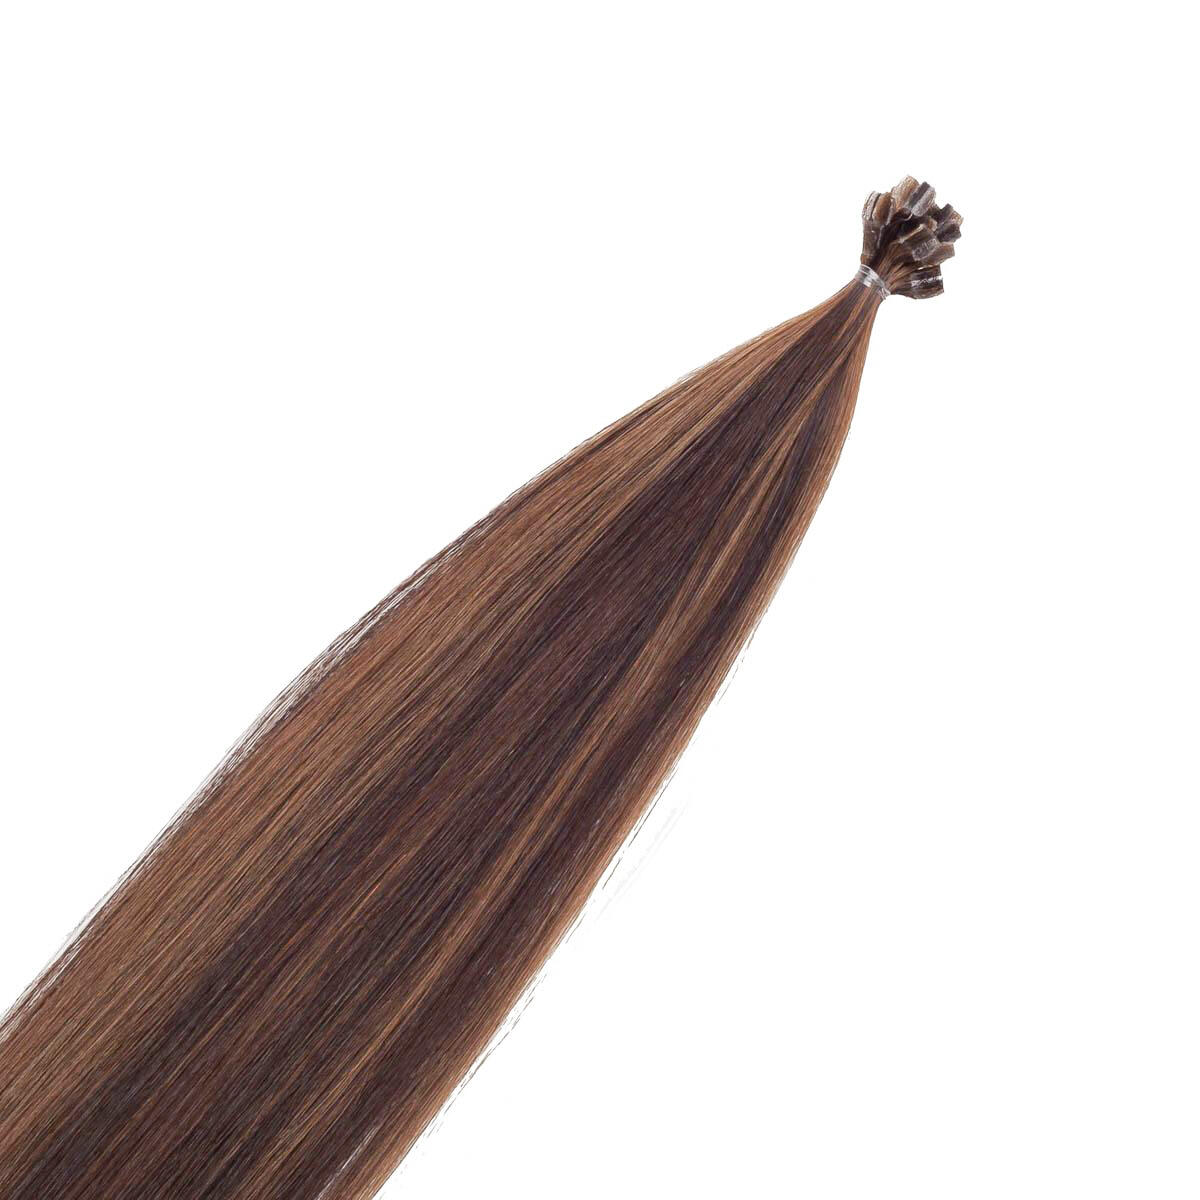 Nail Hair Original M2.3/5.0 Chocolate Mix 60 cm